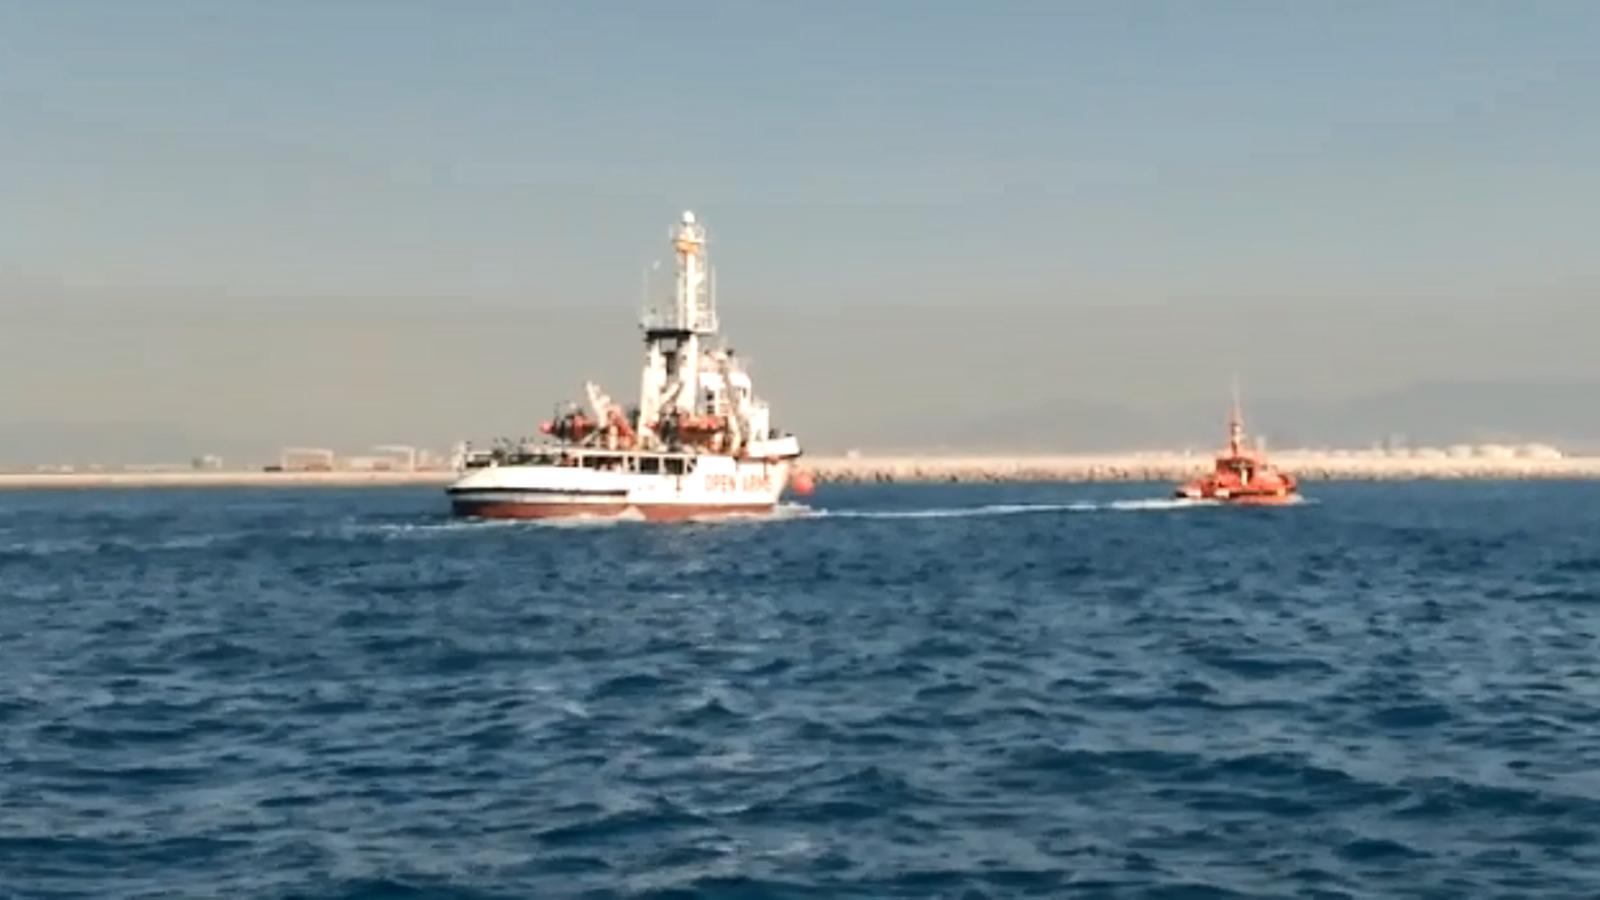 El vaixell 'Open Arms' entra al port de Barcelona